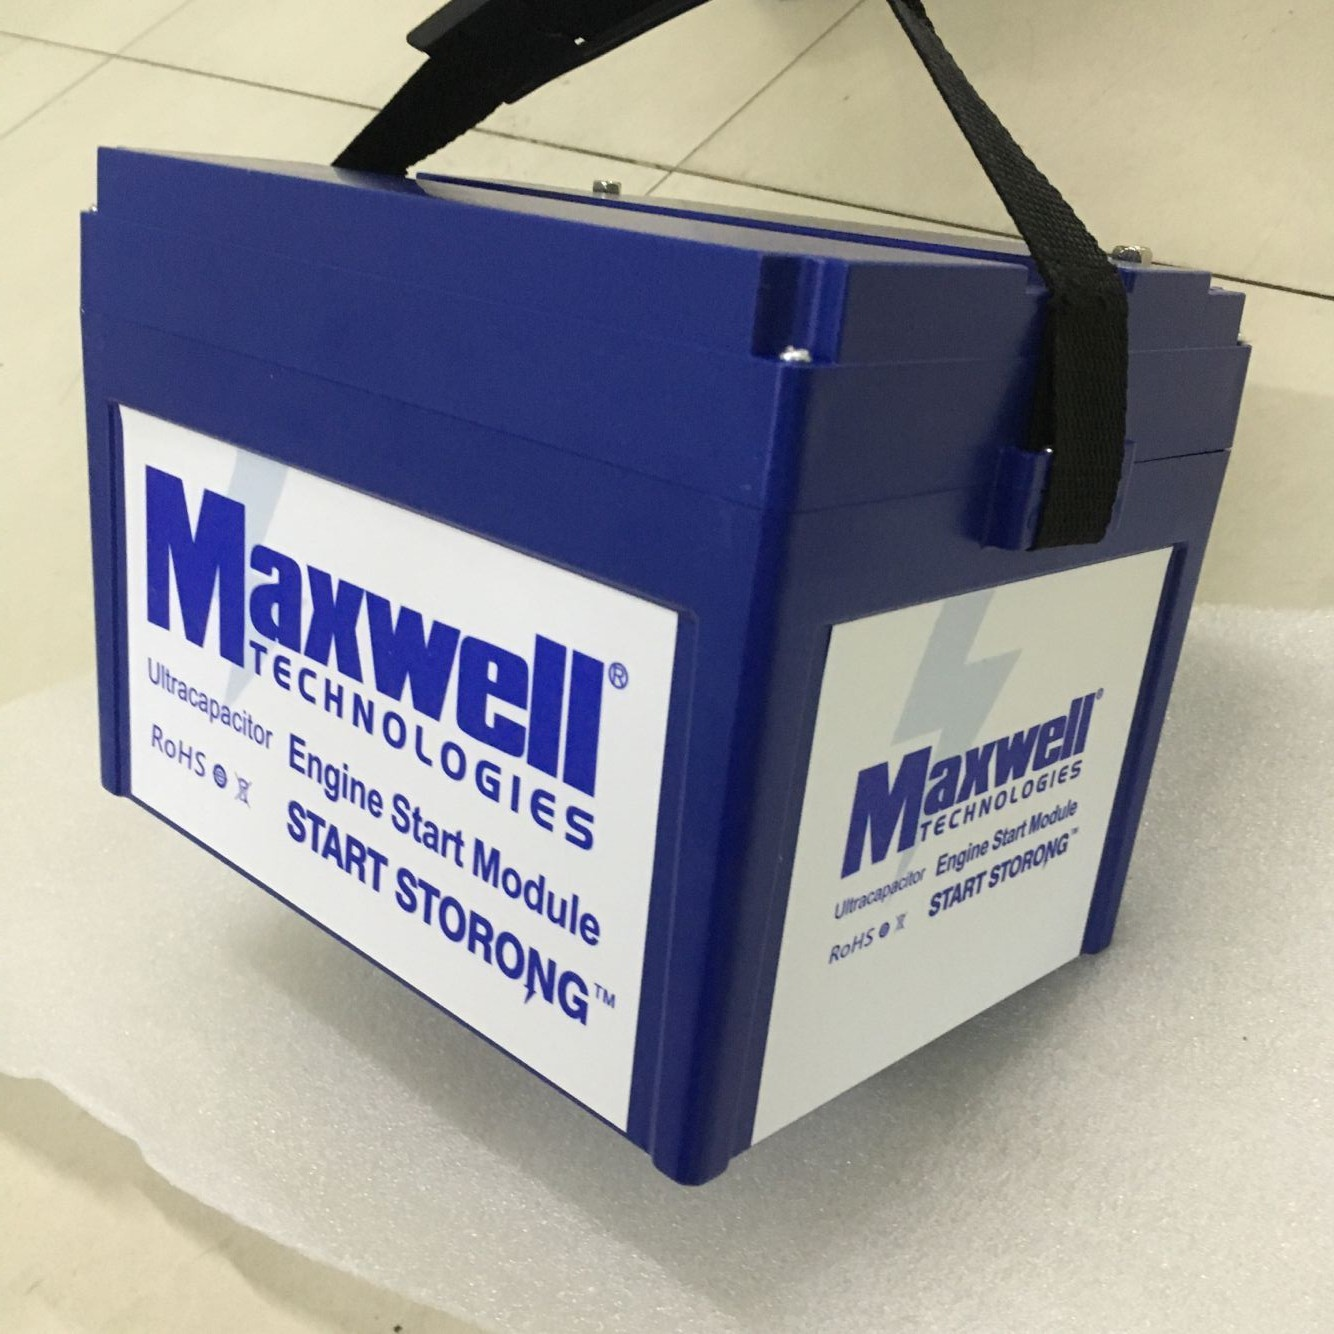 Maxwell 16v 500f Super Capacitor Battery 12v Graphene Car Audio  Ultracapacitor Solar Power System Home - Buy Super Capacitor Battery,Solar  Power